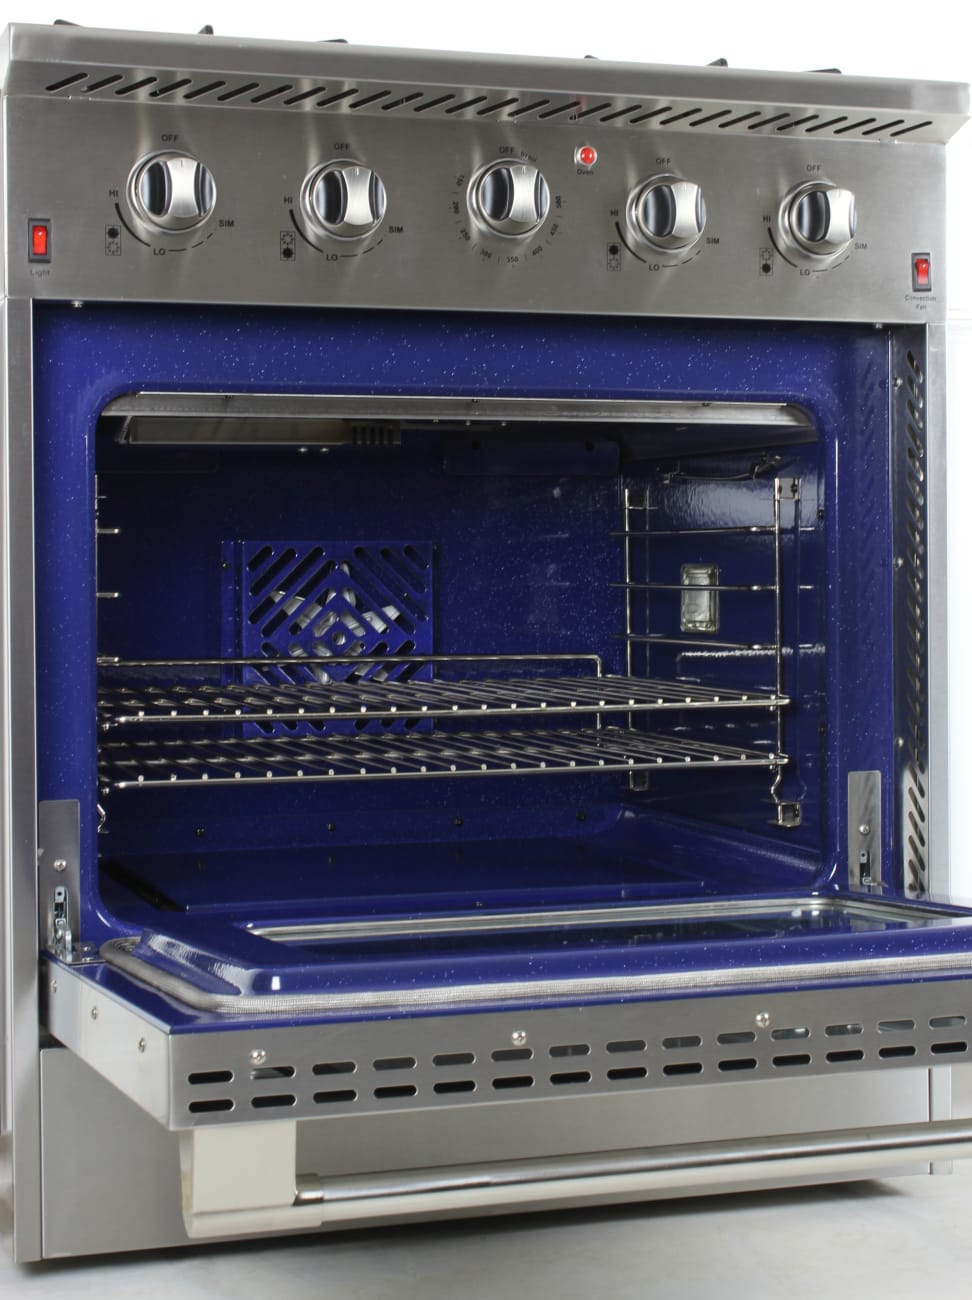 NXR DRGB3001 Oven Cavity